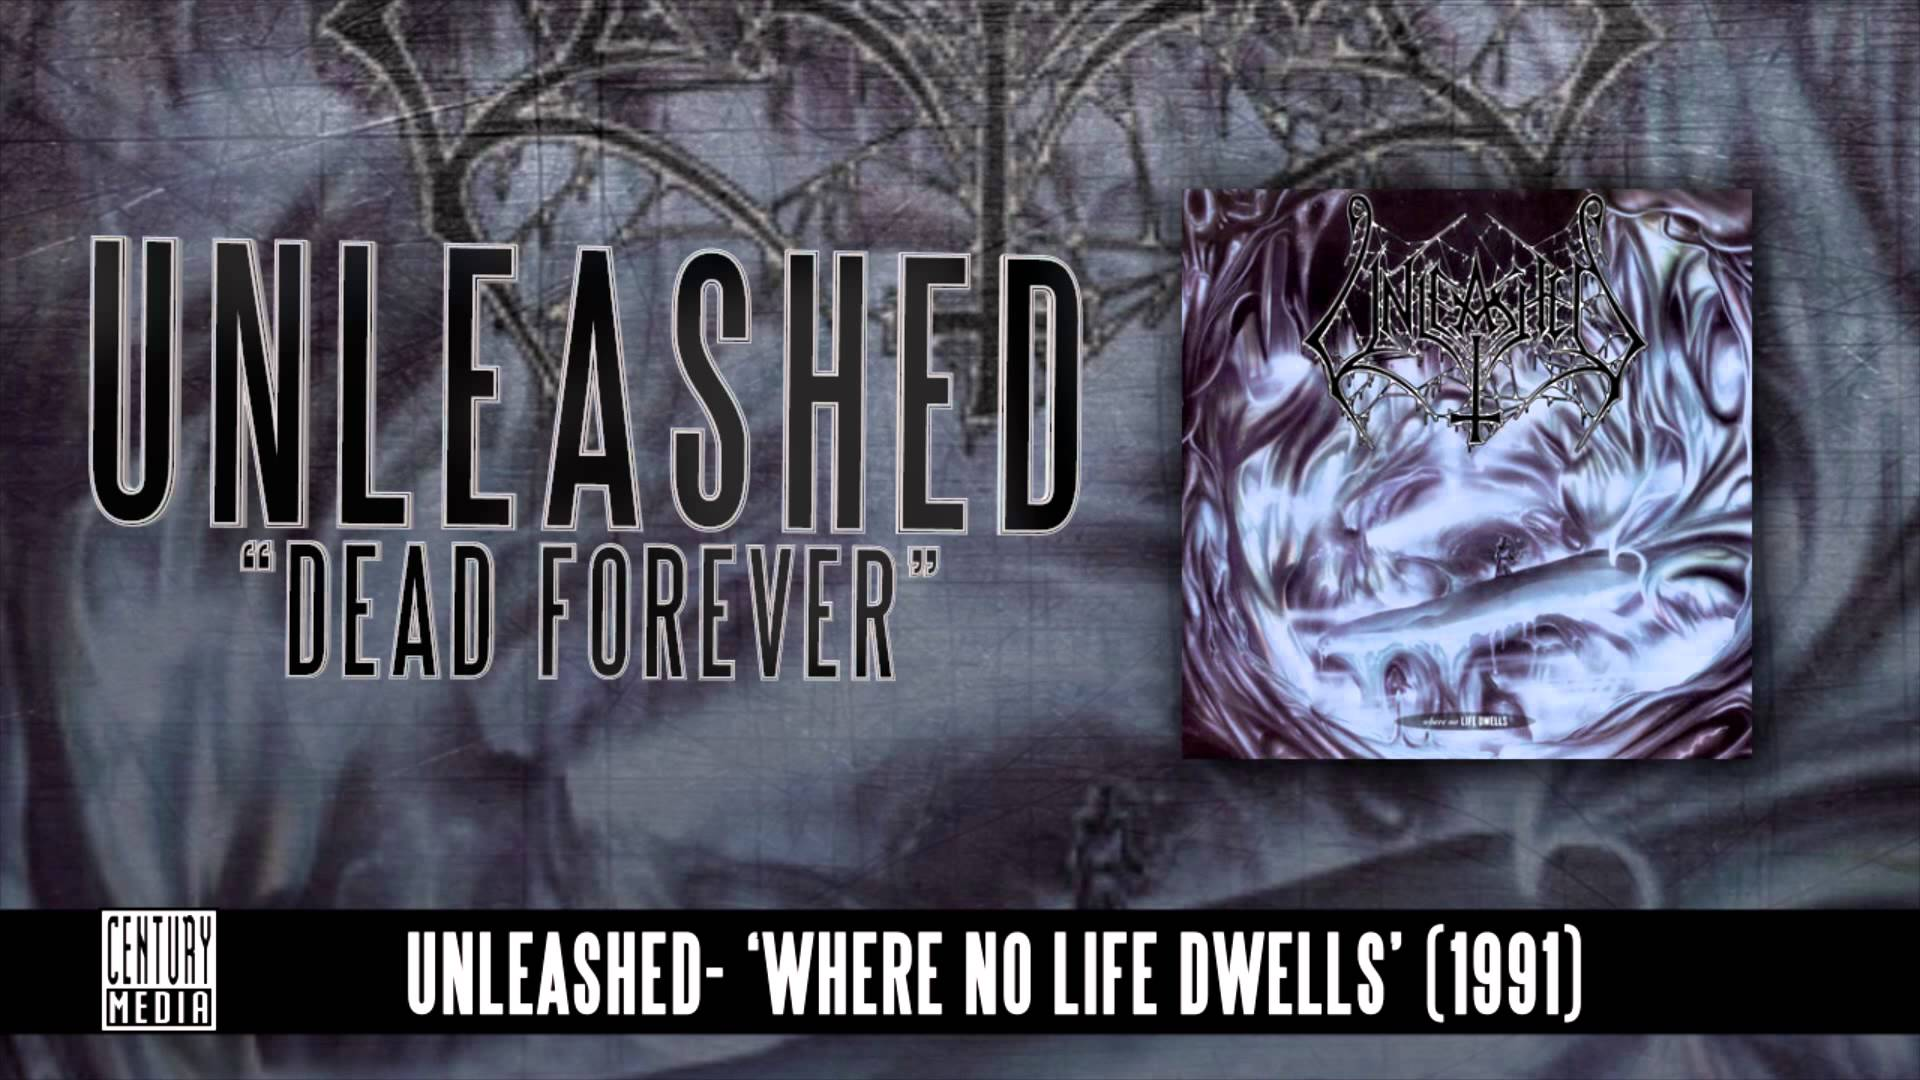 UNLEASHED - Dead Forever (ALBUM TRACK)